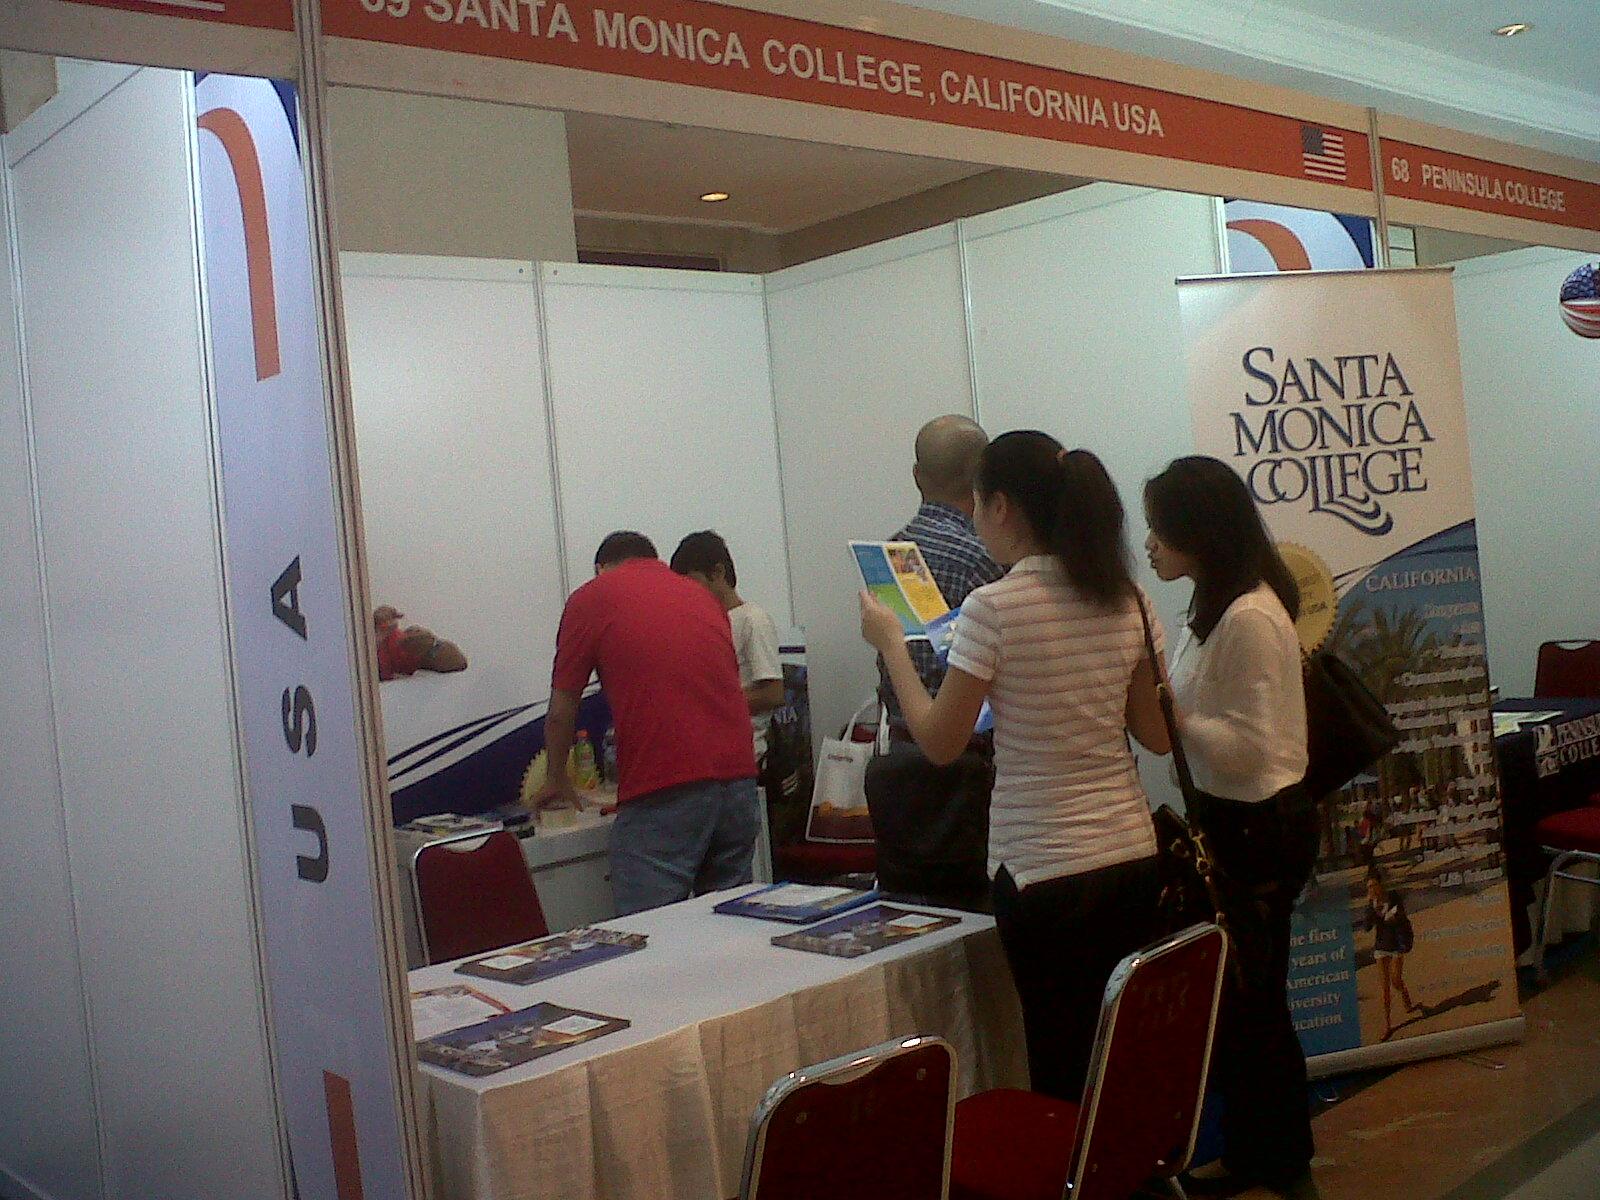 Unistart News Events SMC Santa Monica College at IKPII event